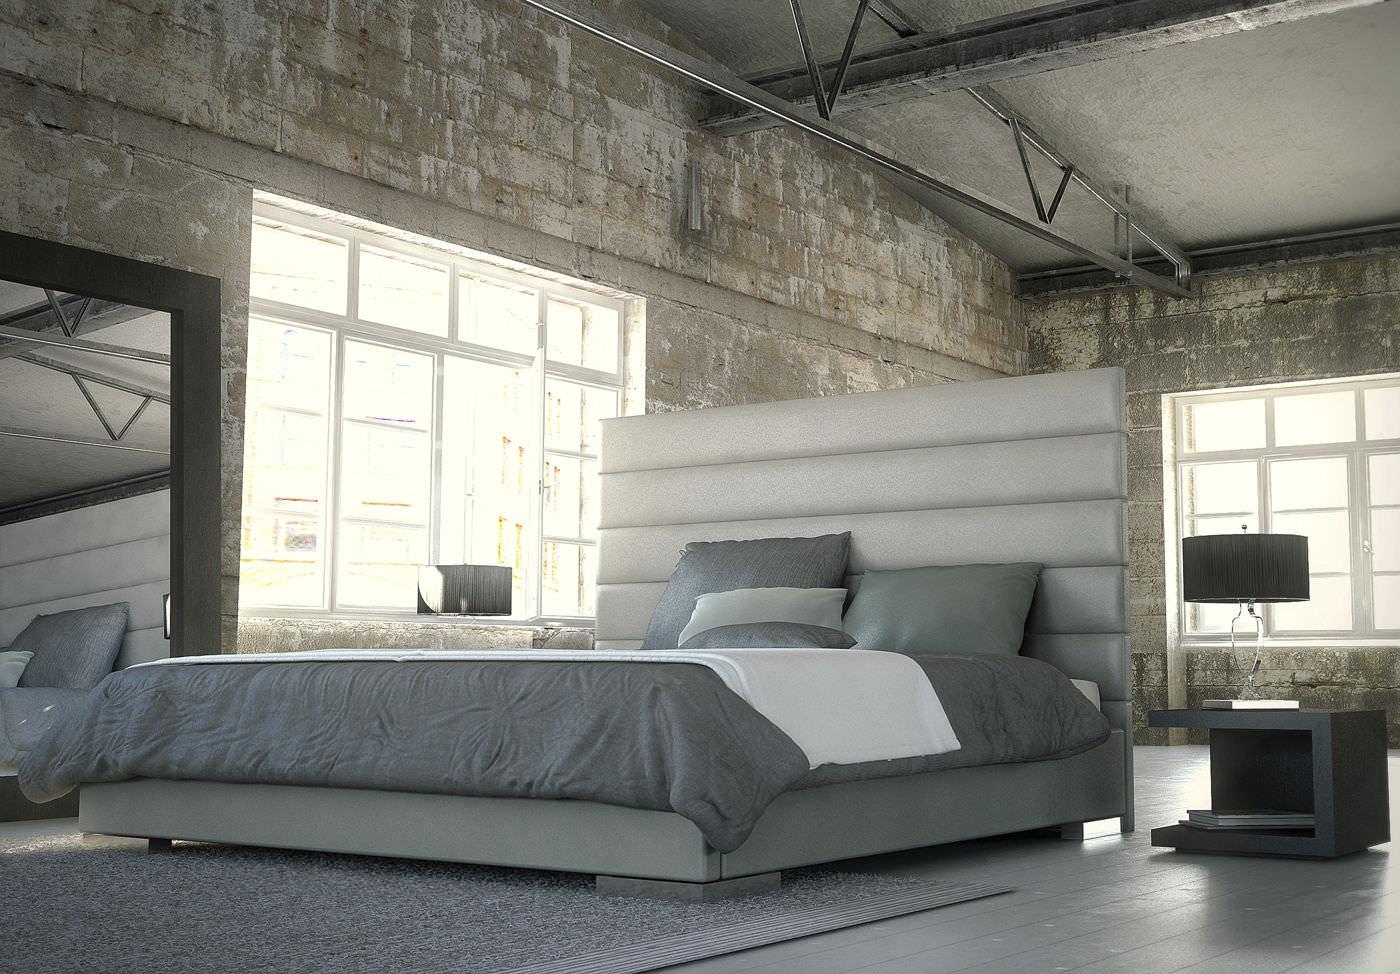 Cabeceros acolchados para tu dormitorio